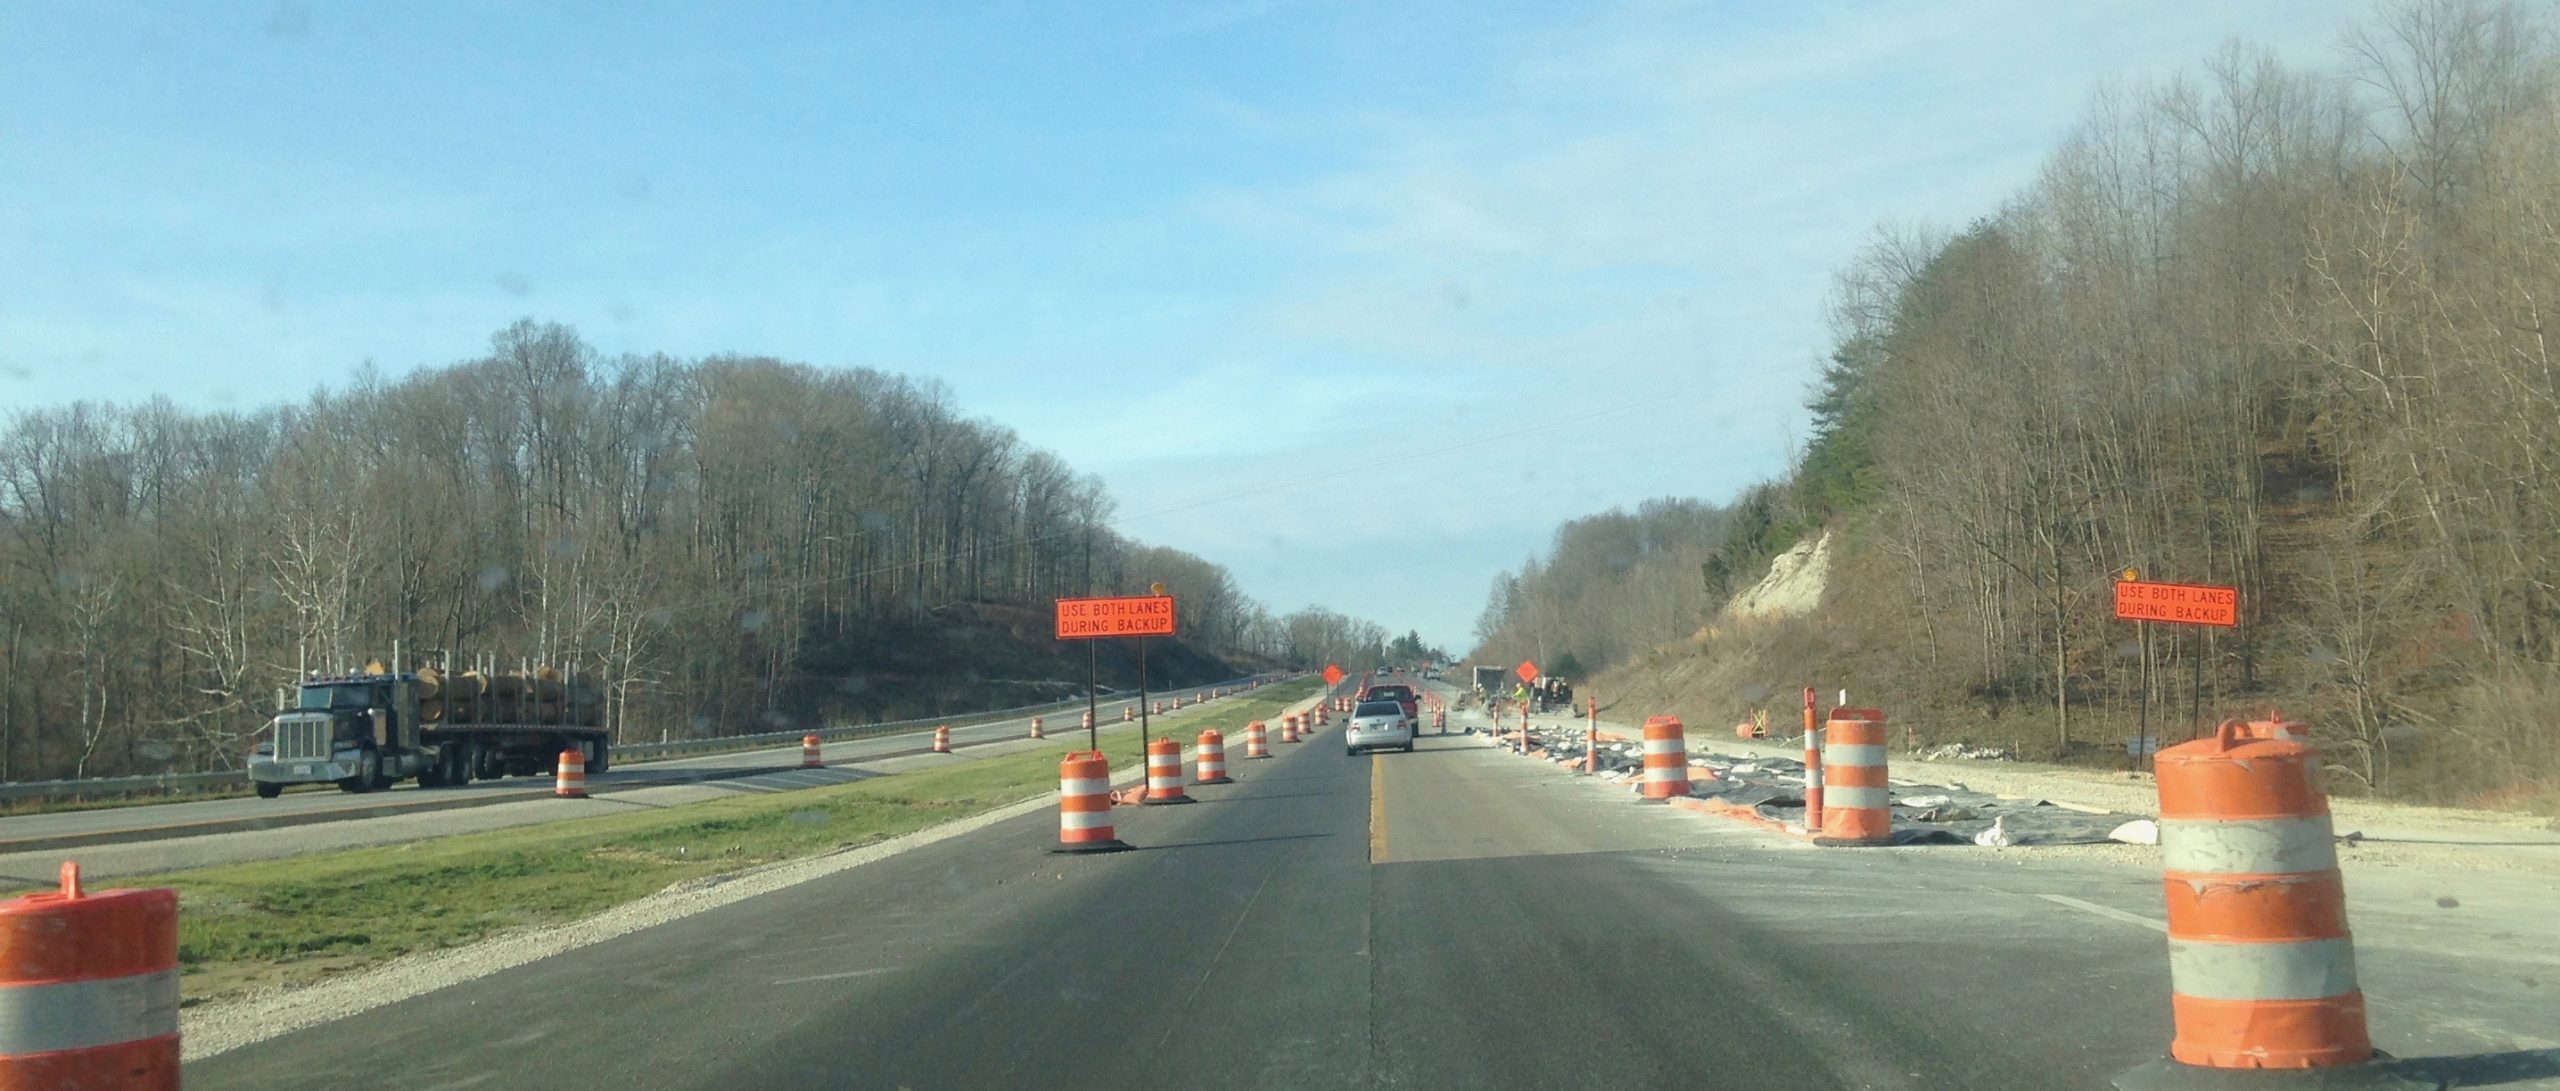 Construction Barrels and traffic